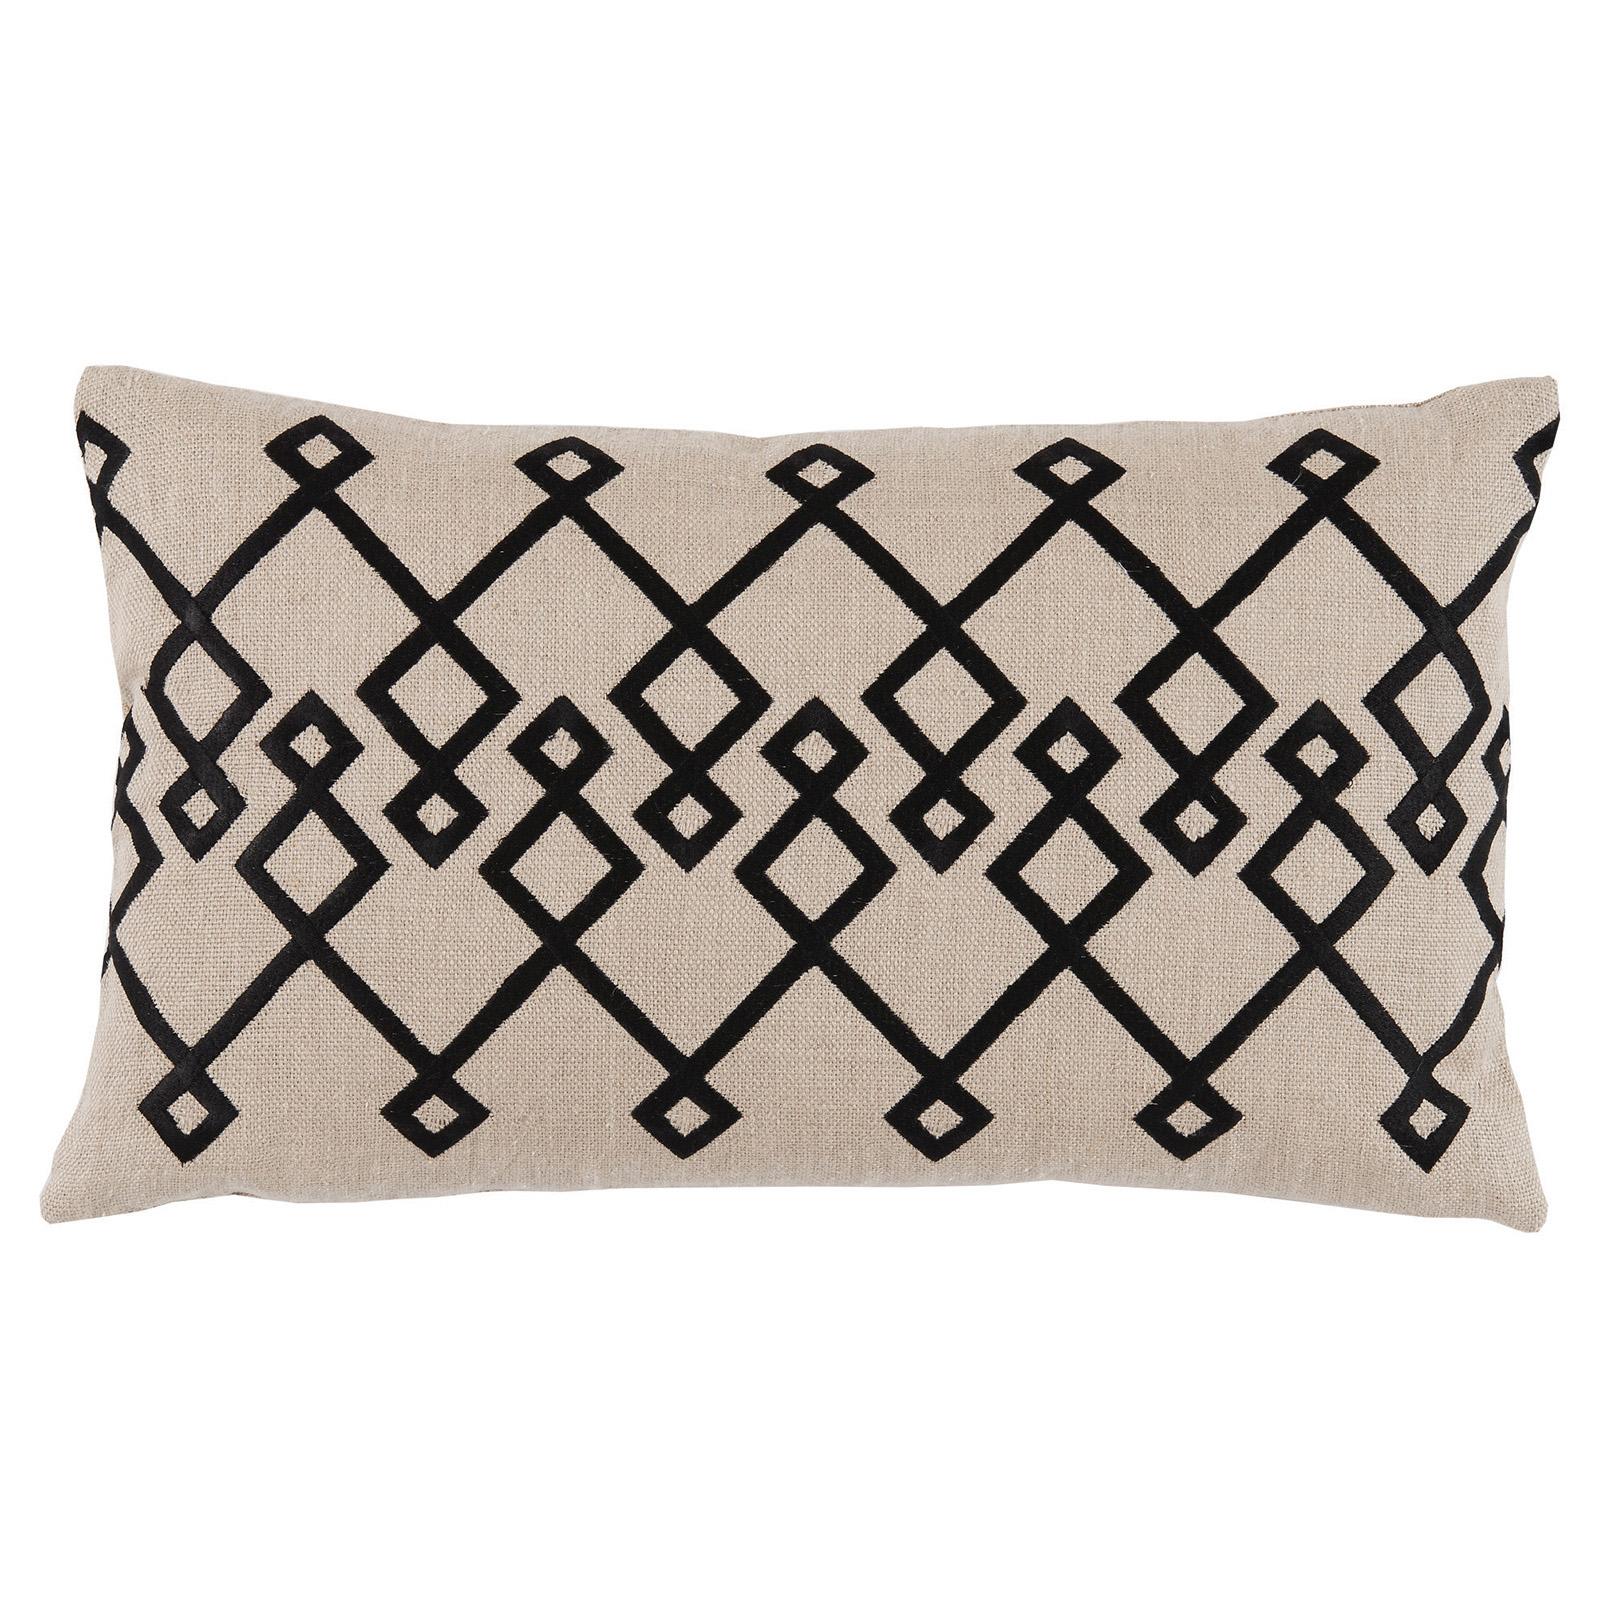 Steph Modern Black Chevron Stitch Beige Pillow - 13x22